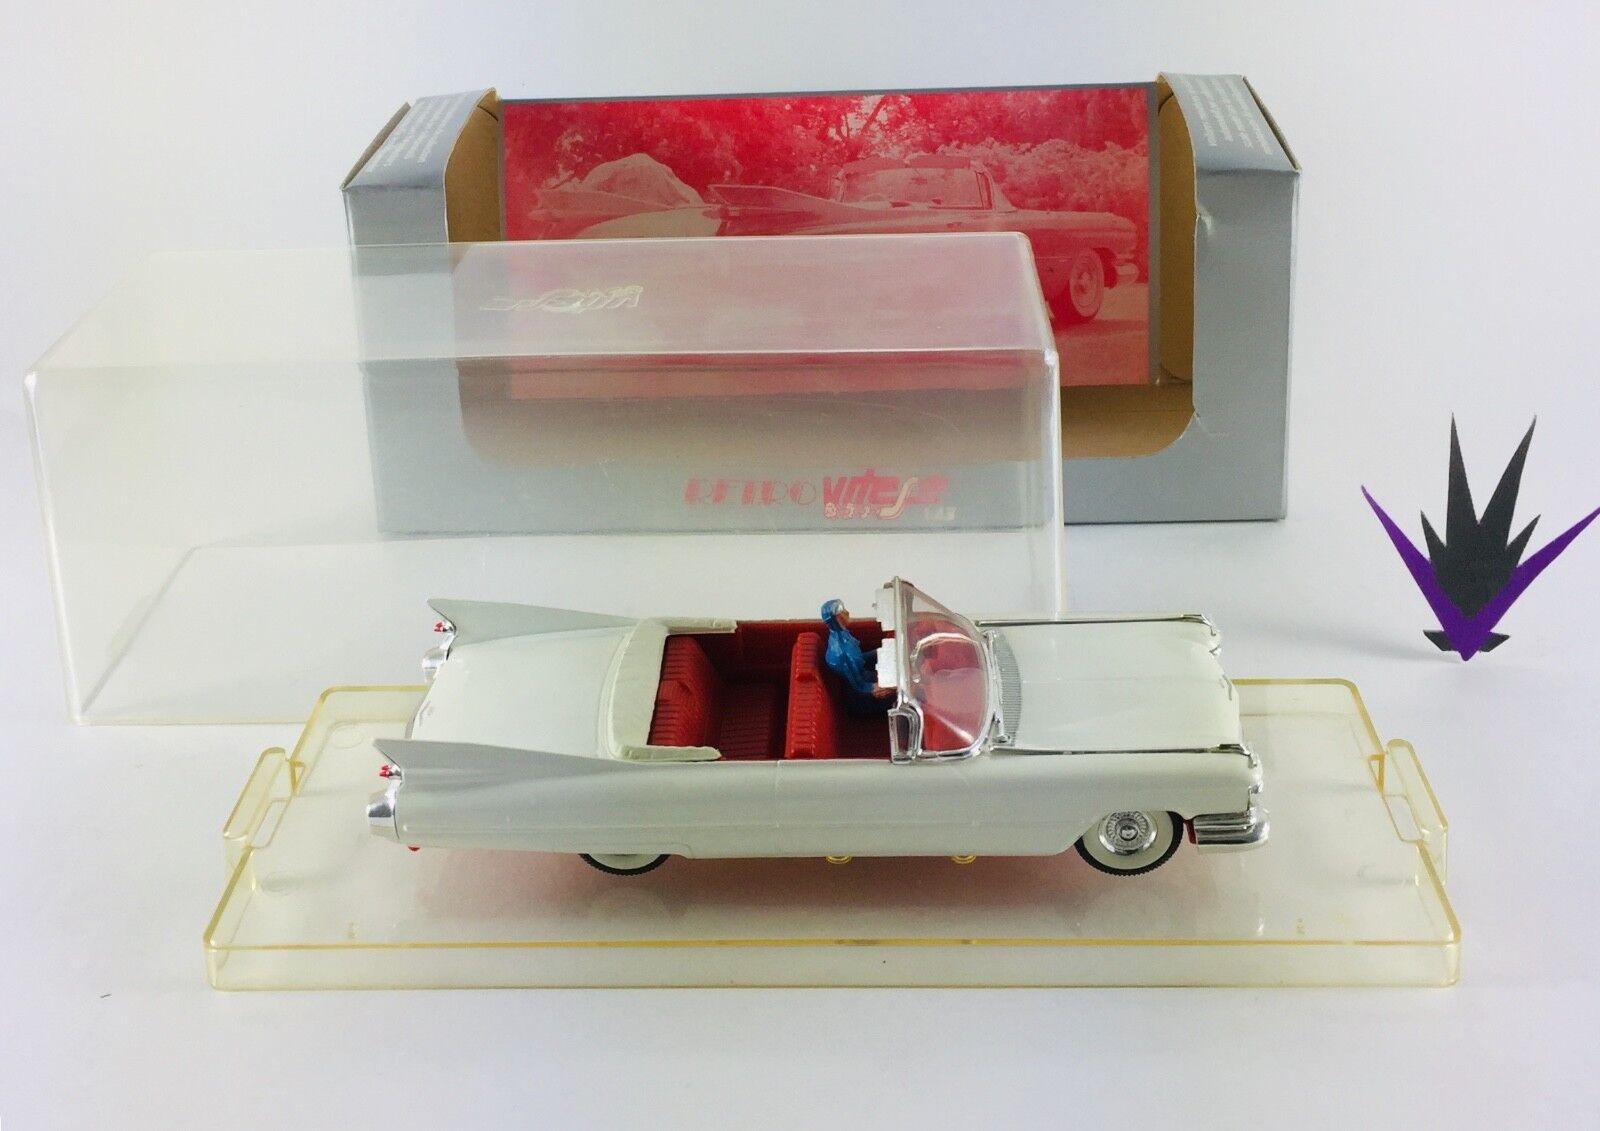 1 43 Cadillac Type 62 1959 Open cabriolet Vitesse